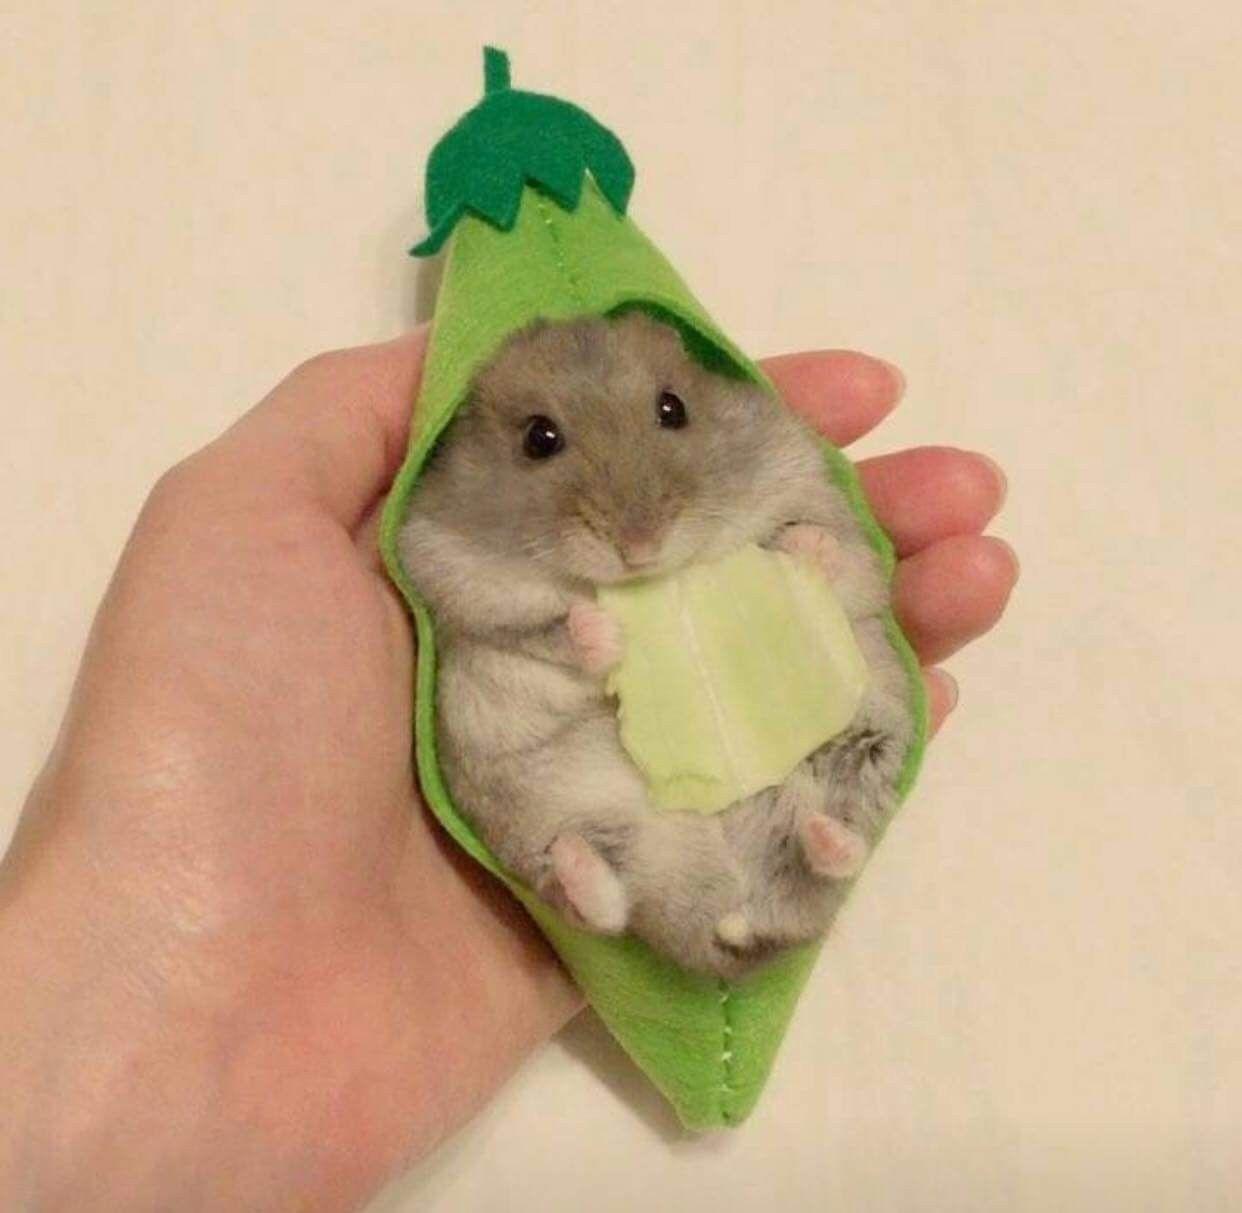 Pin By Iaza Hussain On Animal Farm Funny Hamsters Cute Hamsters Cute Funny Animals